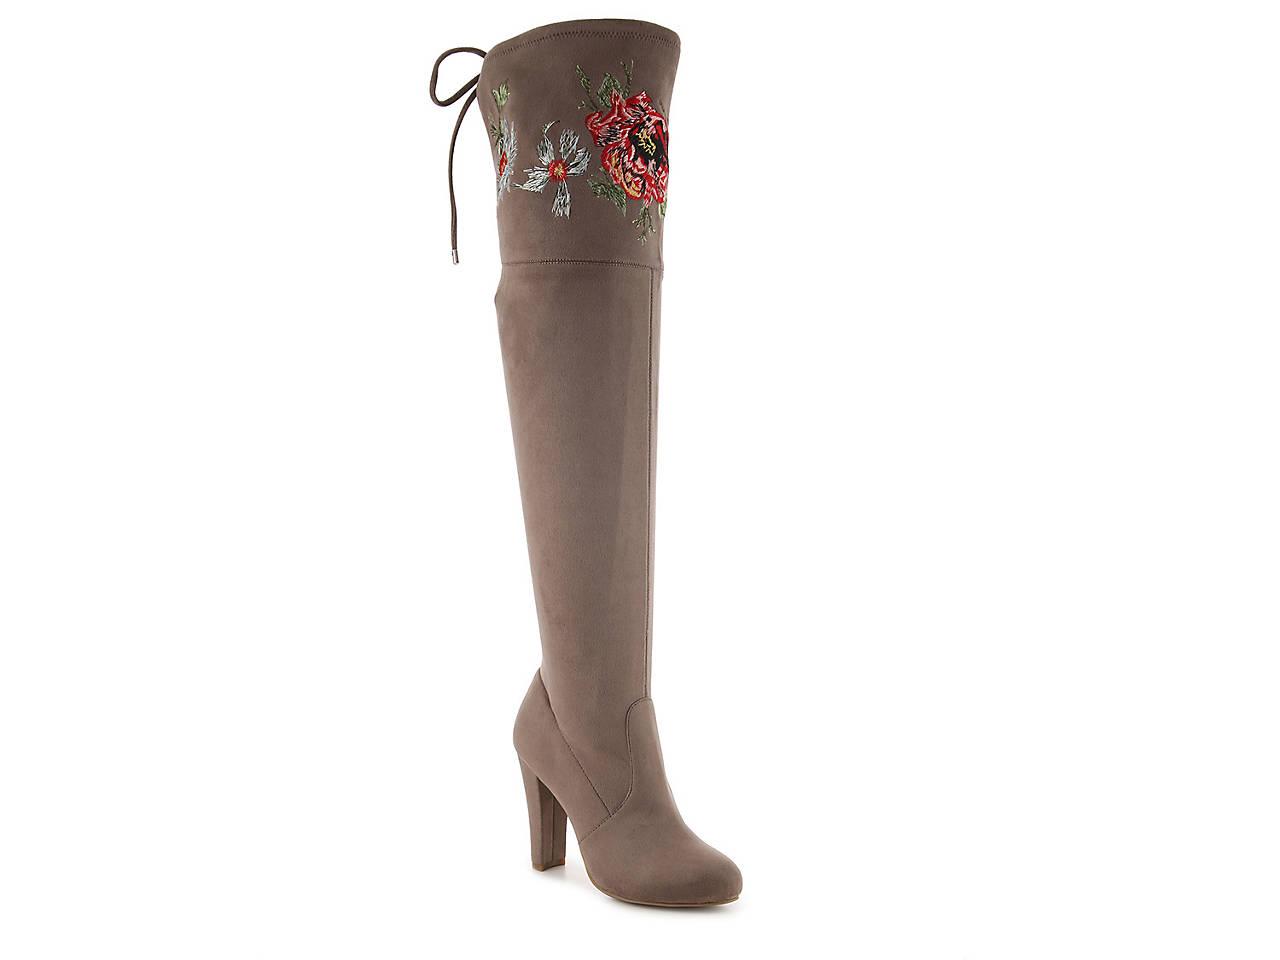 5984625be31 Zigi Soho Bryna Over The Knee Boot Women s Shoes